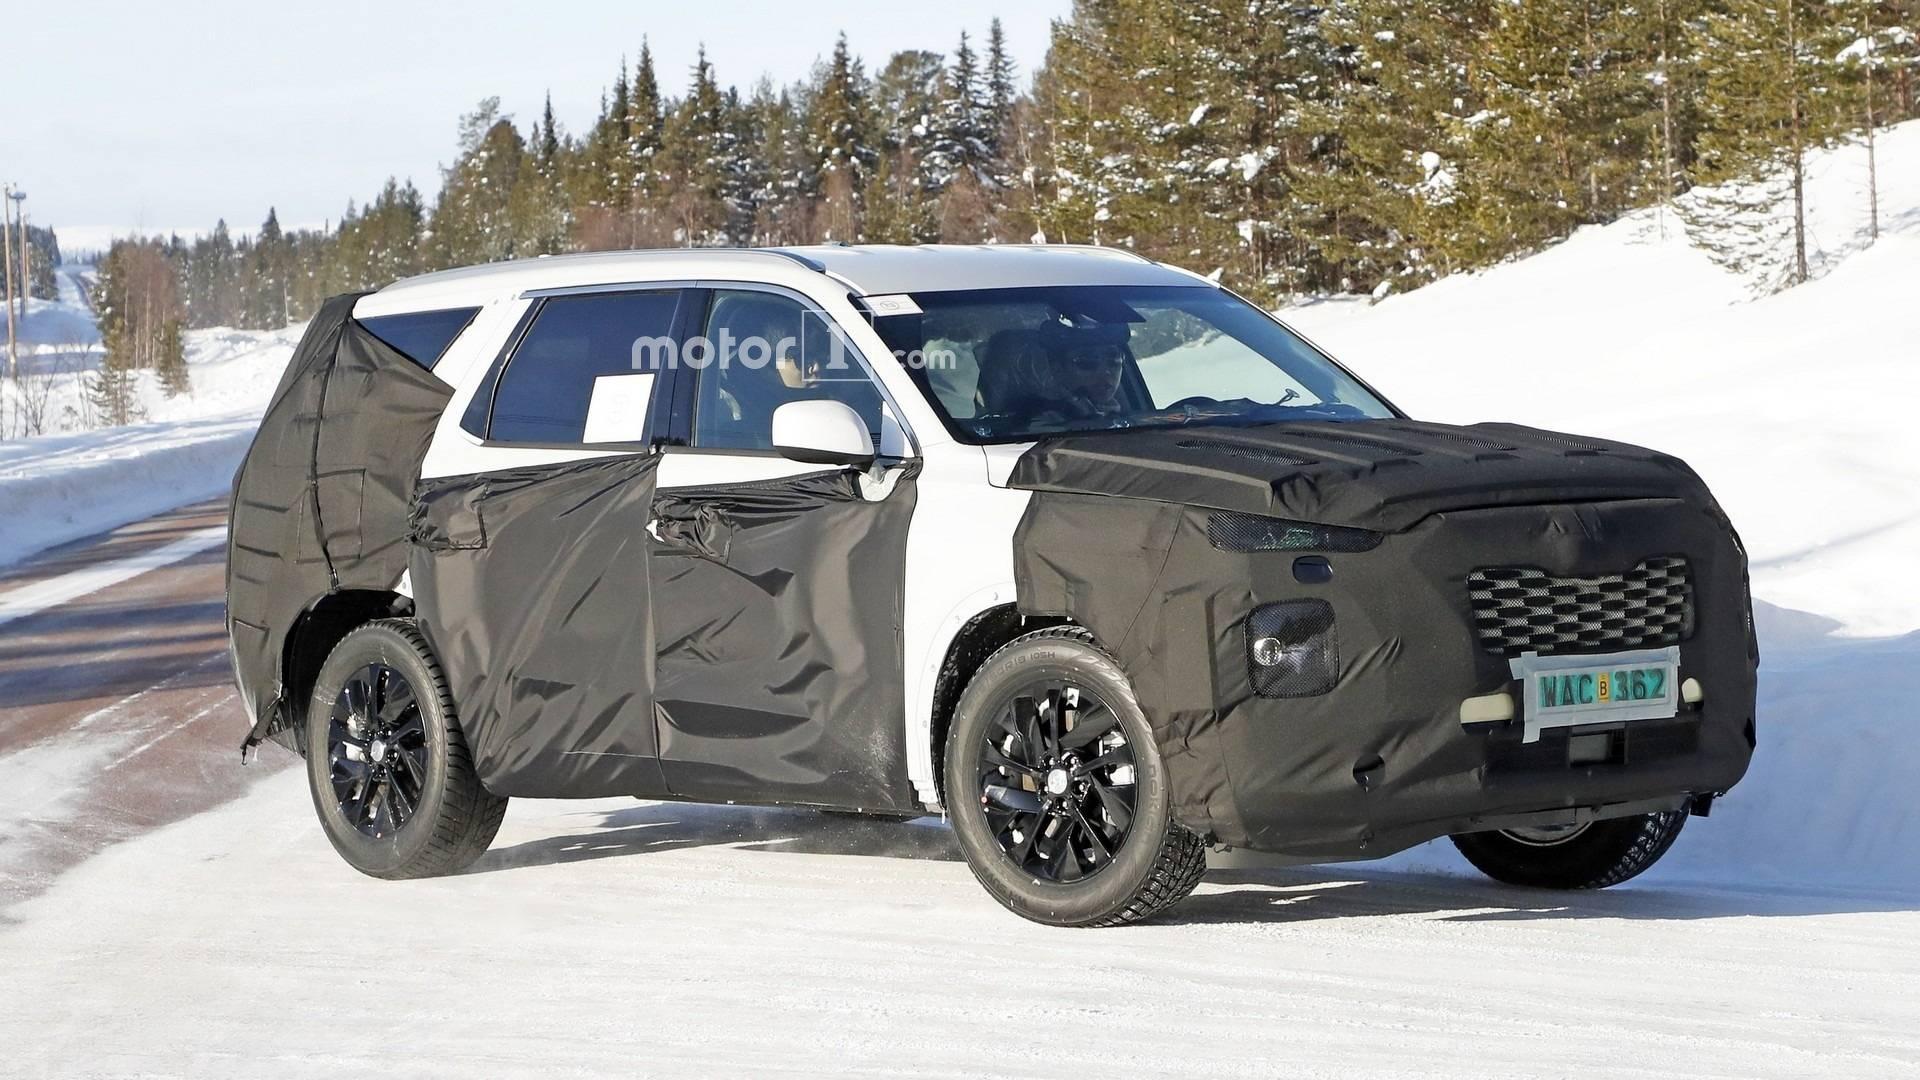 8 Seat Hyundai Suv Makes 18 Inch Wheels Look Small In Spy Shots